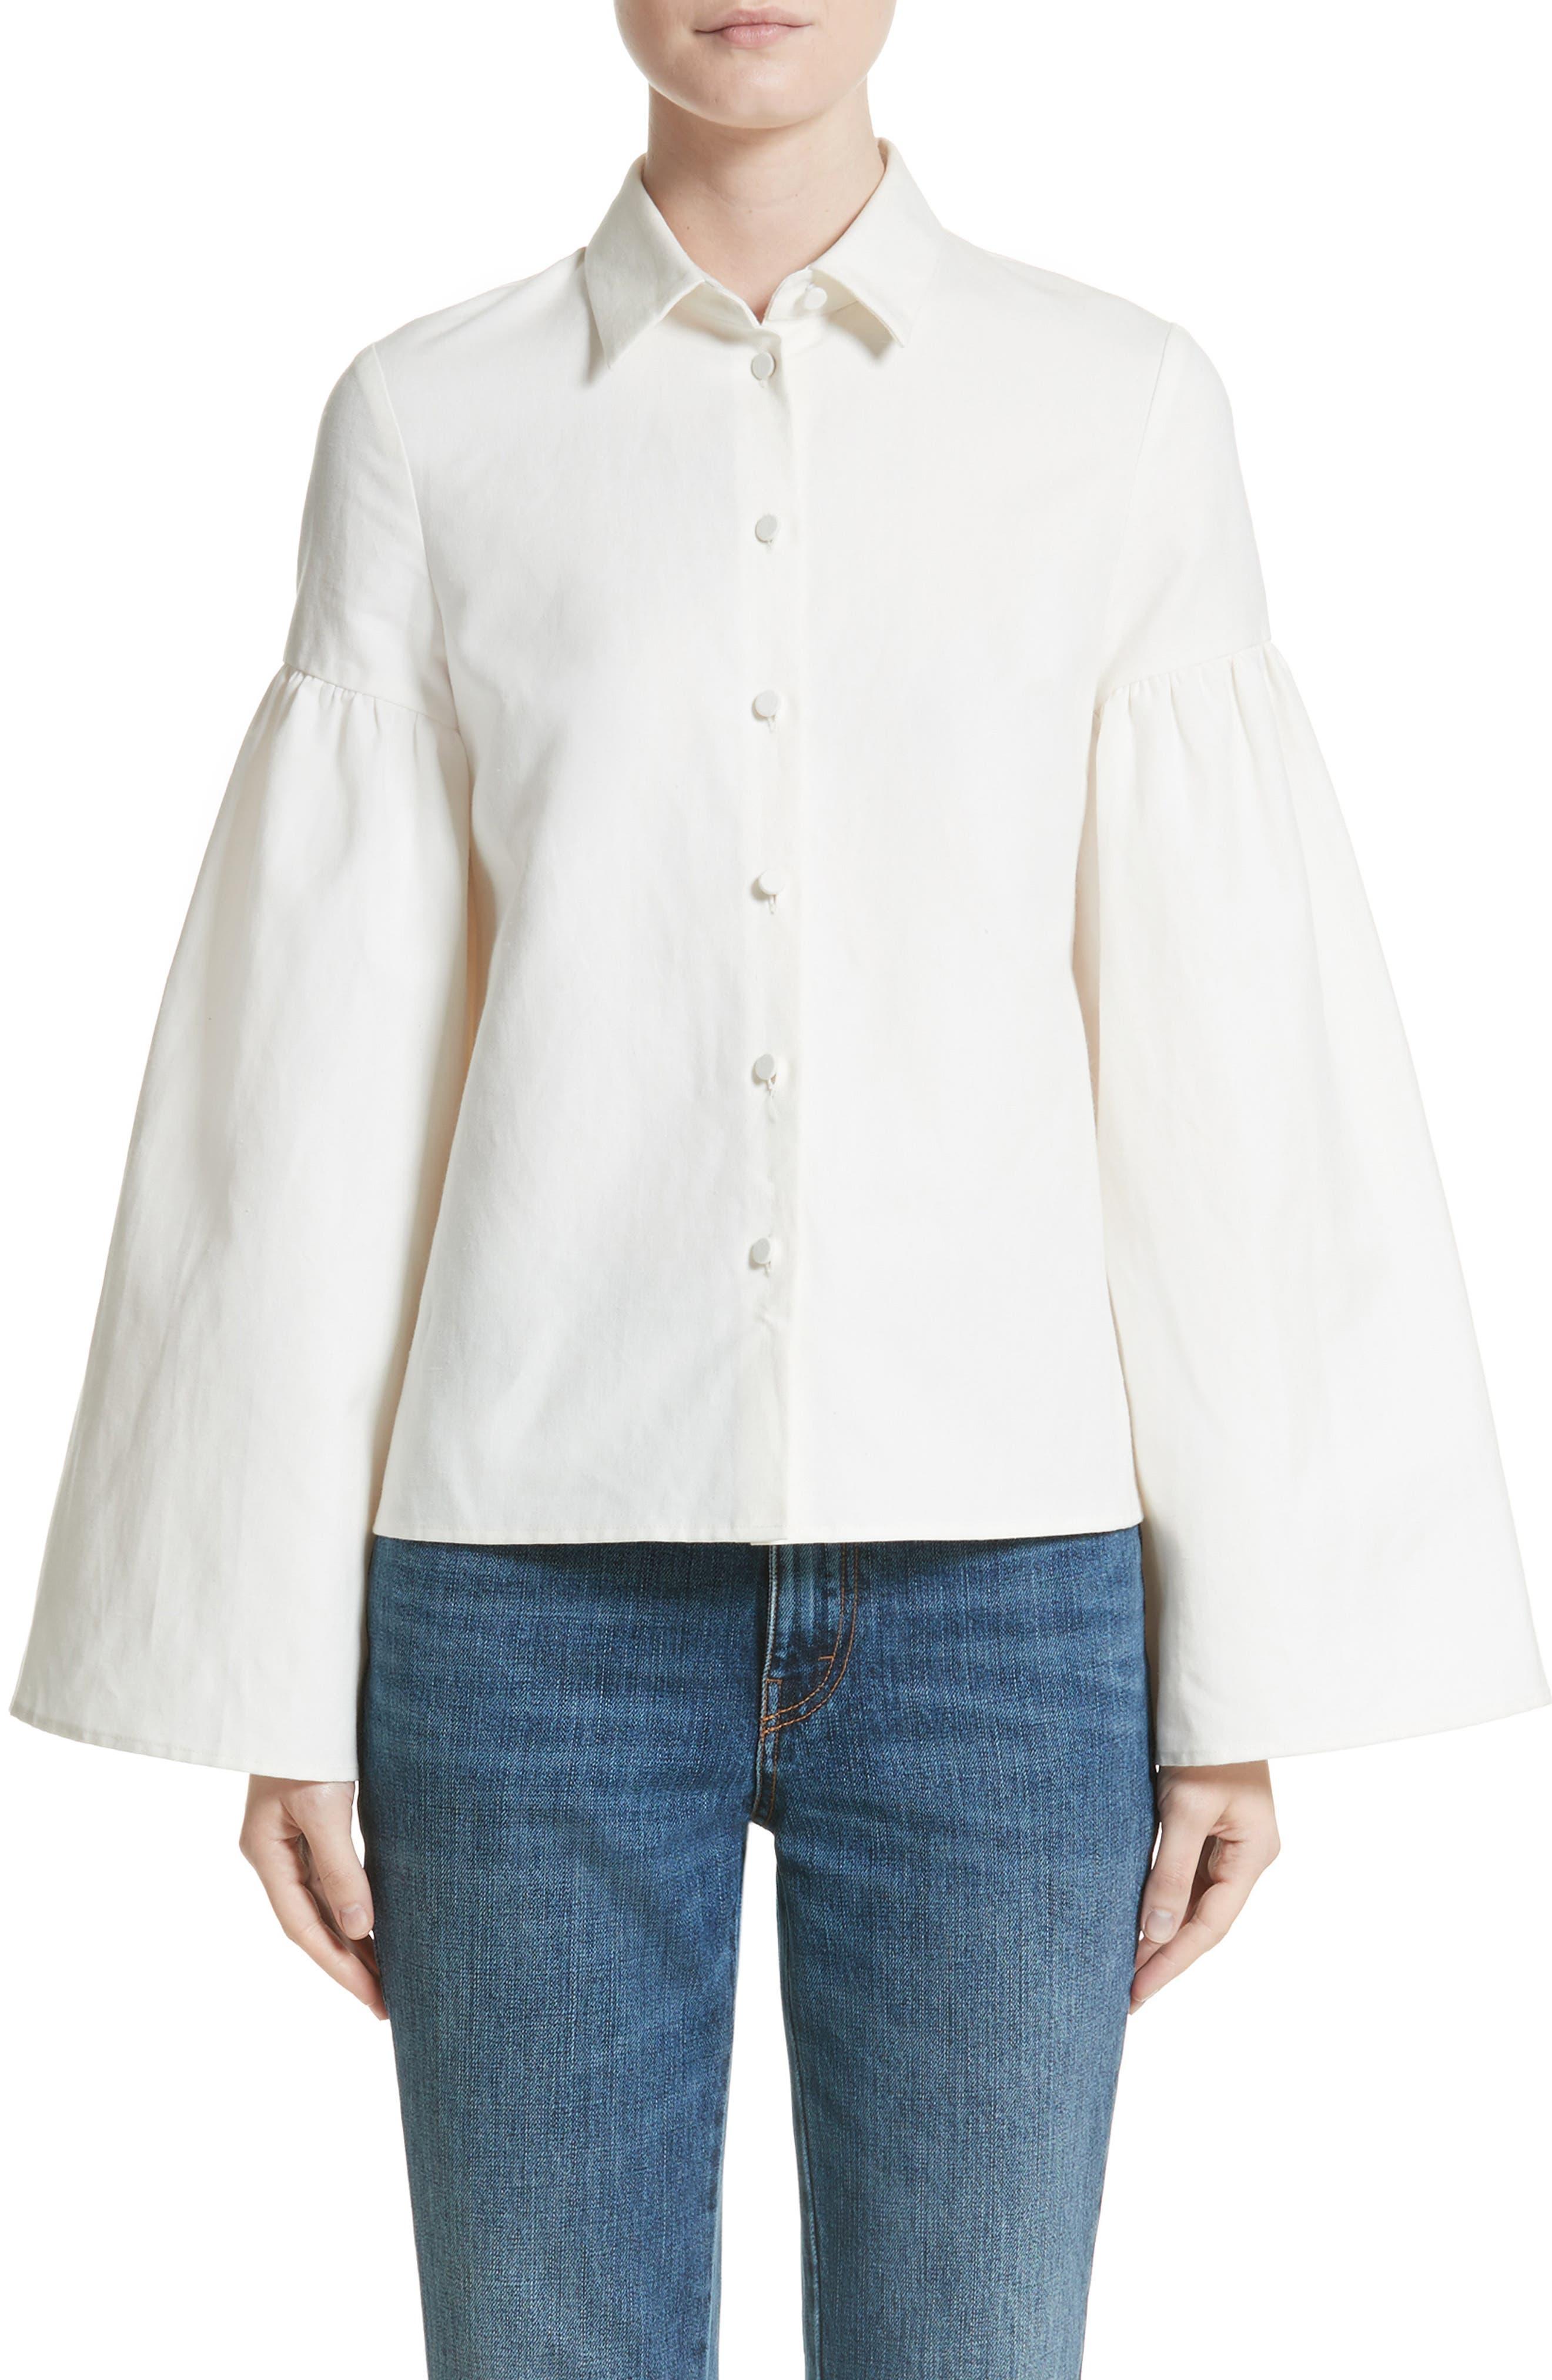 Linen & Cotton Puff Sleeve Top,                             Main thumbnail 1, color,                             900